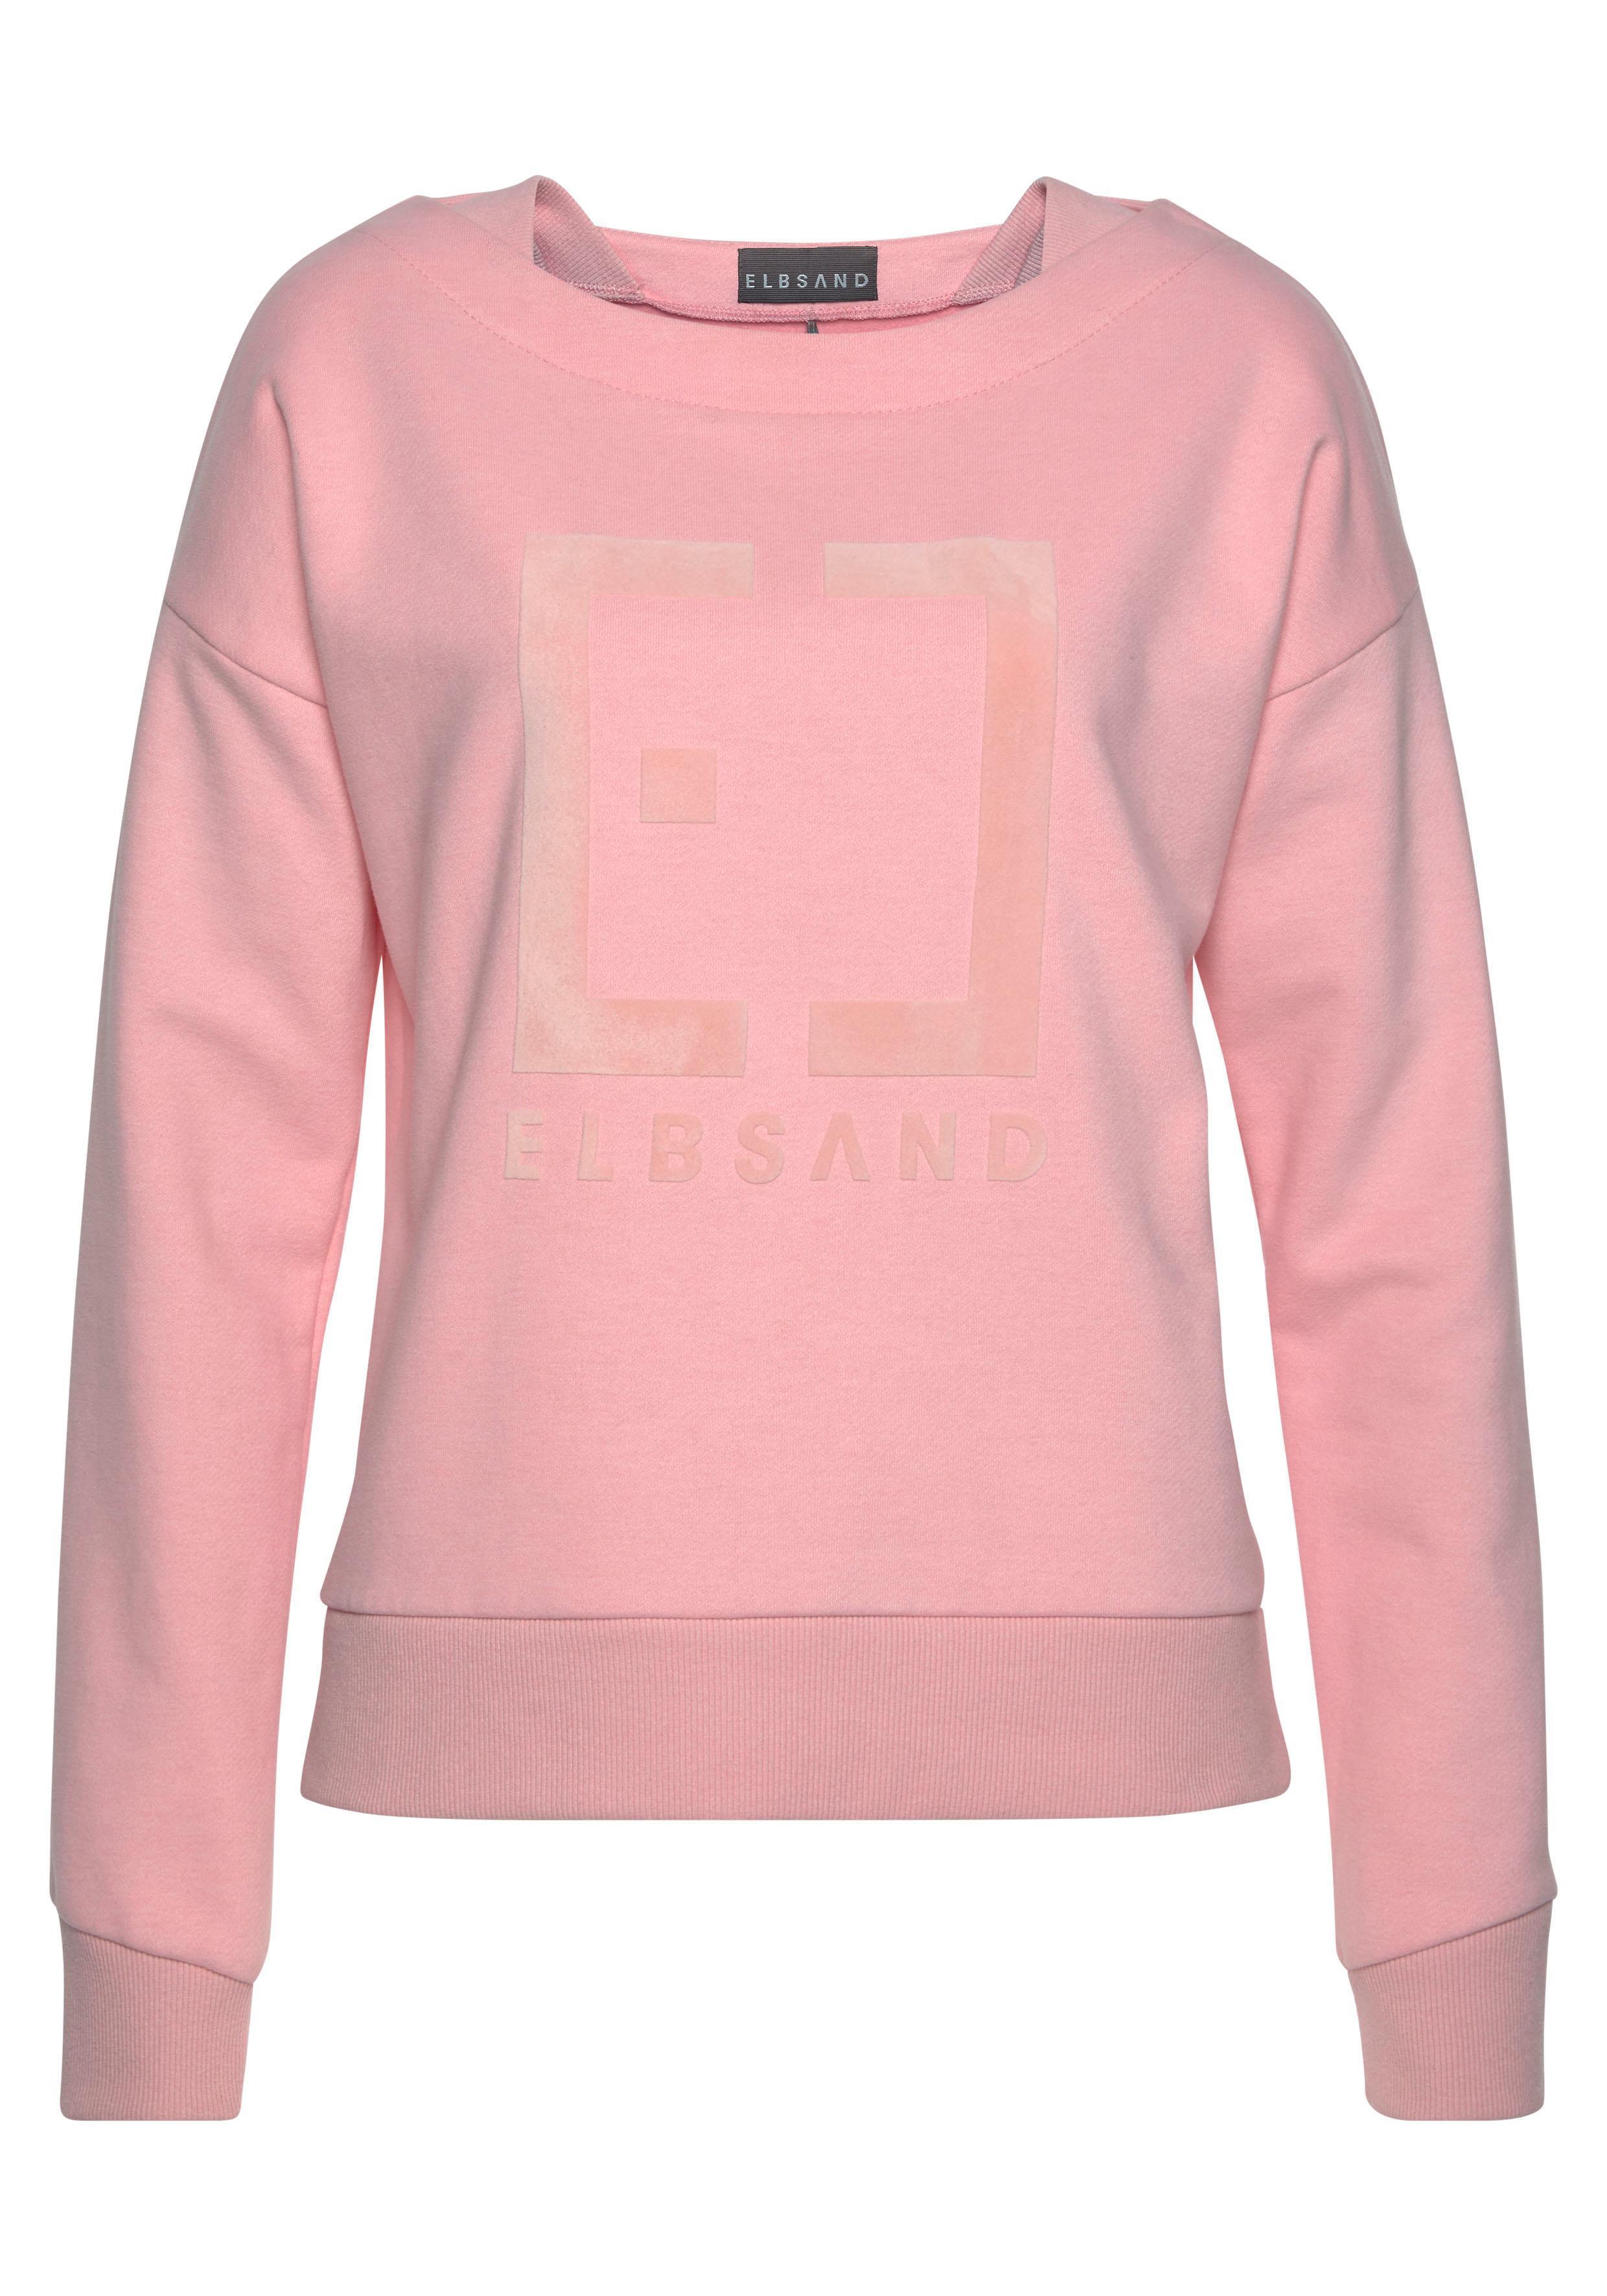 Elbsand Sweatshirt Finnia | Bekleidung > Sweatshirts & -jacken > Sweatshirts | Elbsand